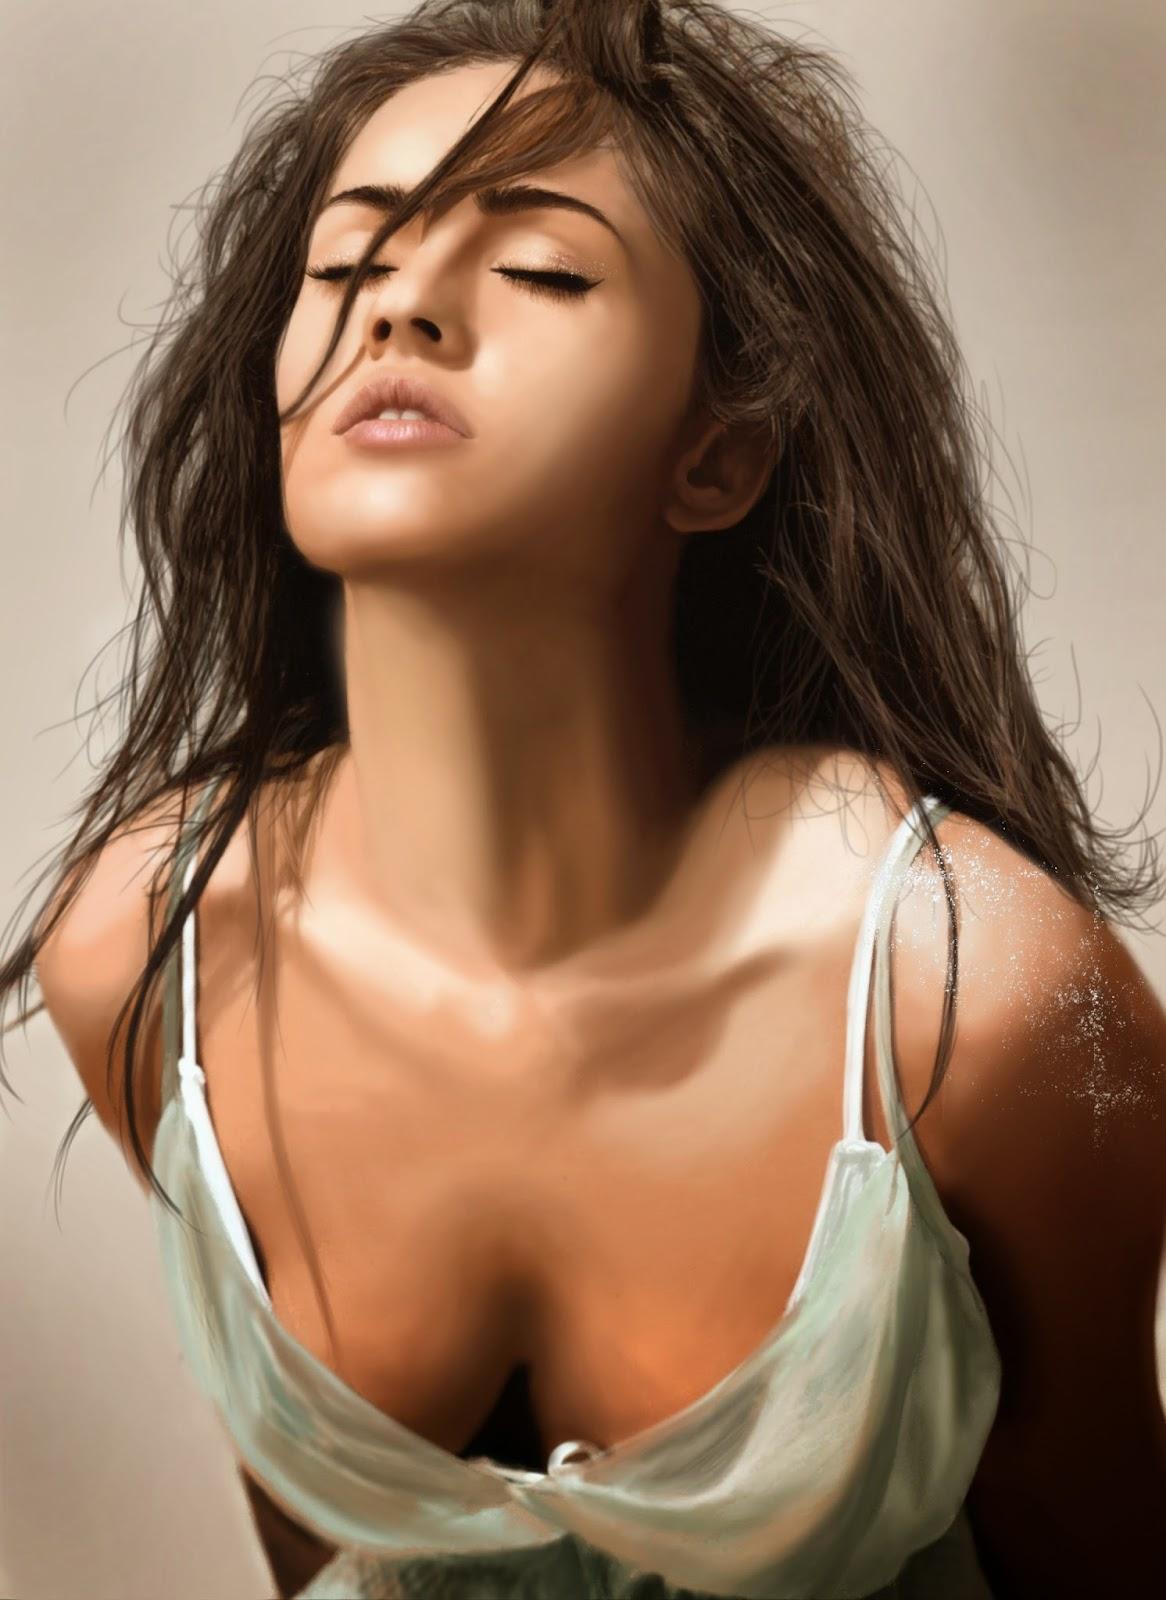 Adriene barbeau nude pics